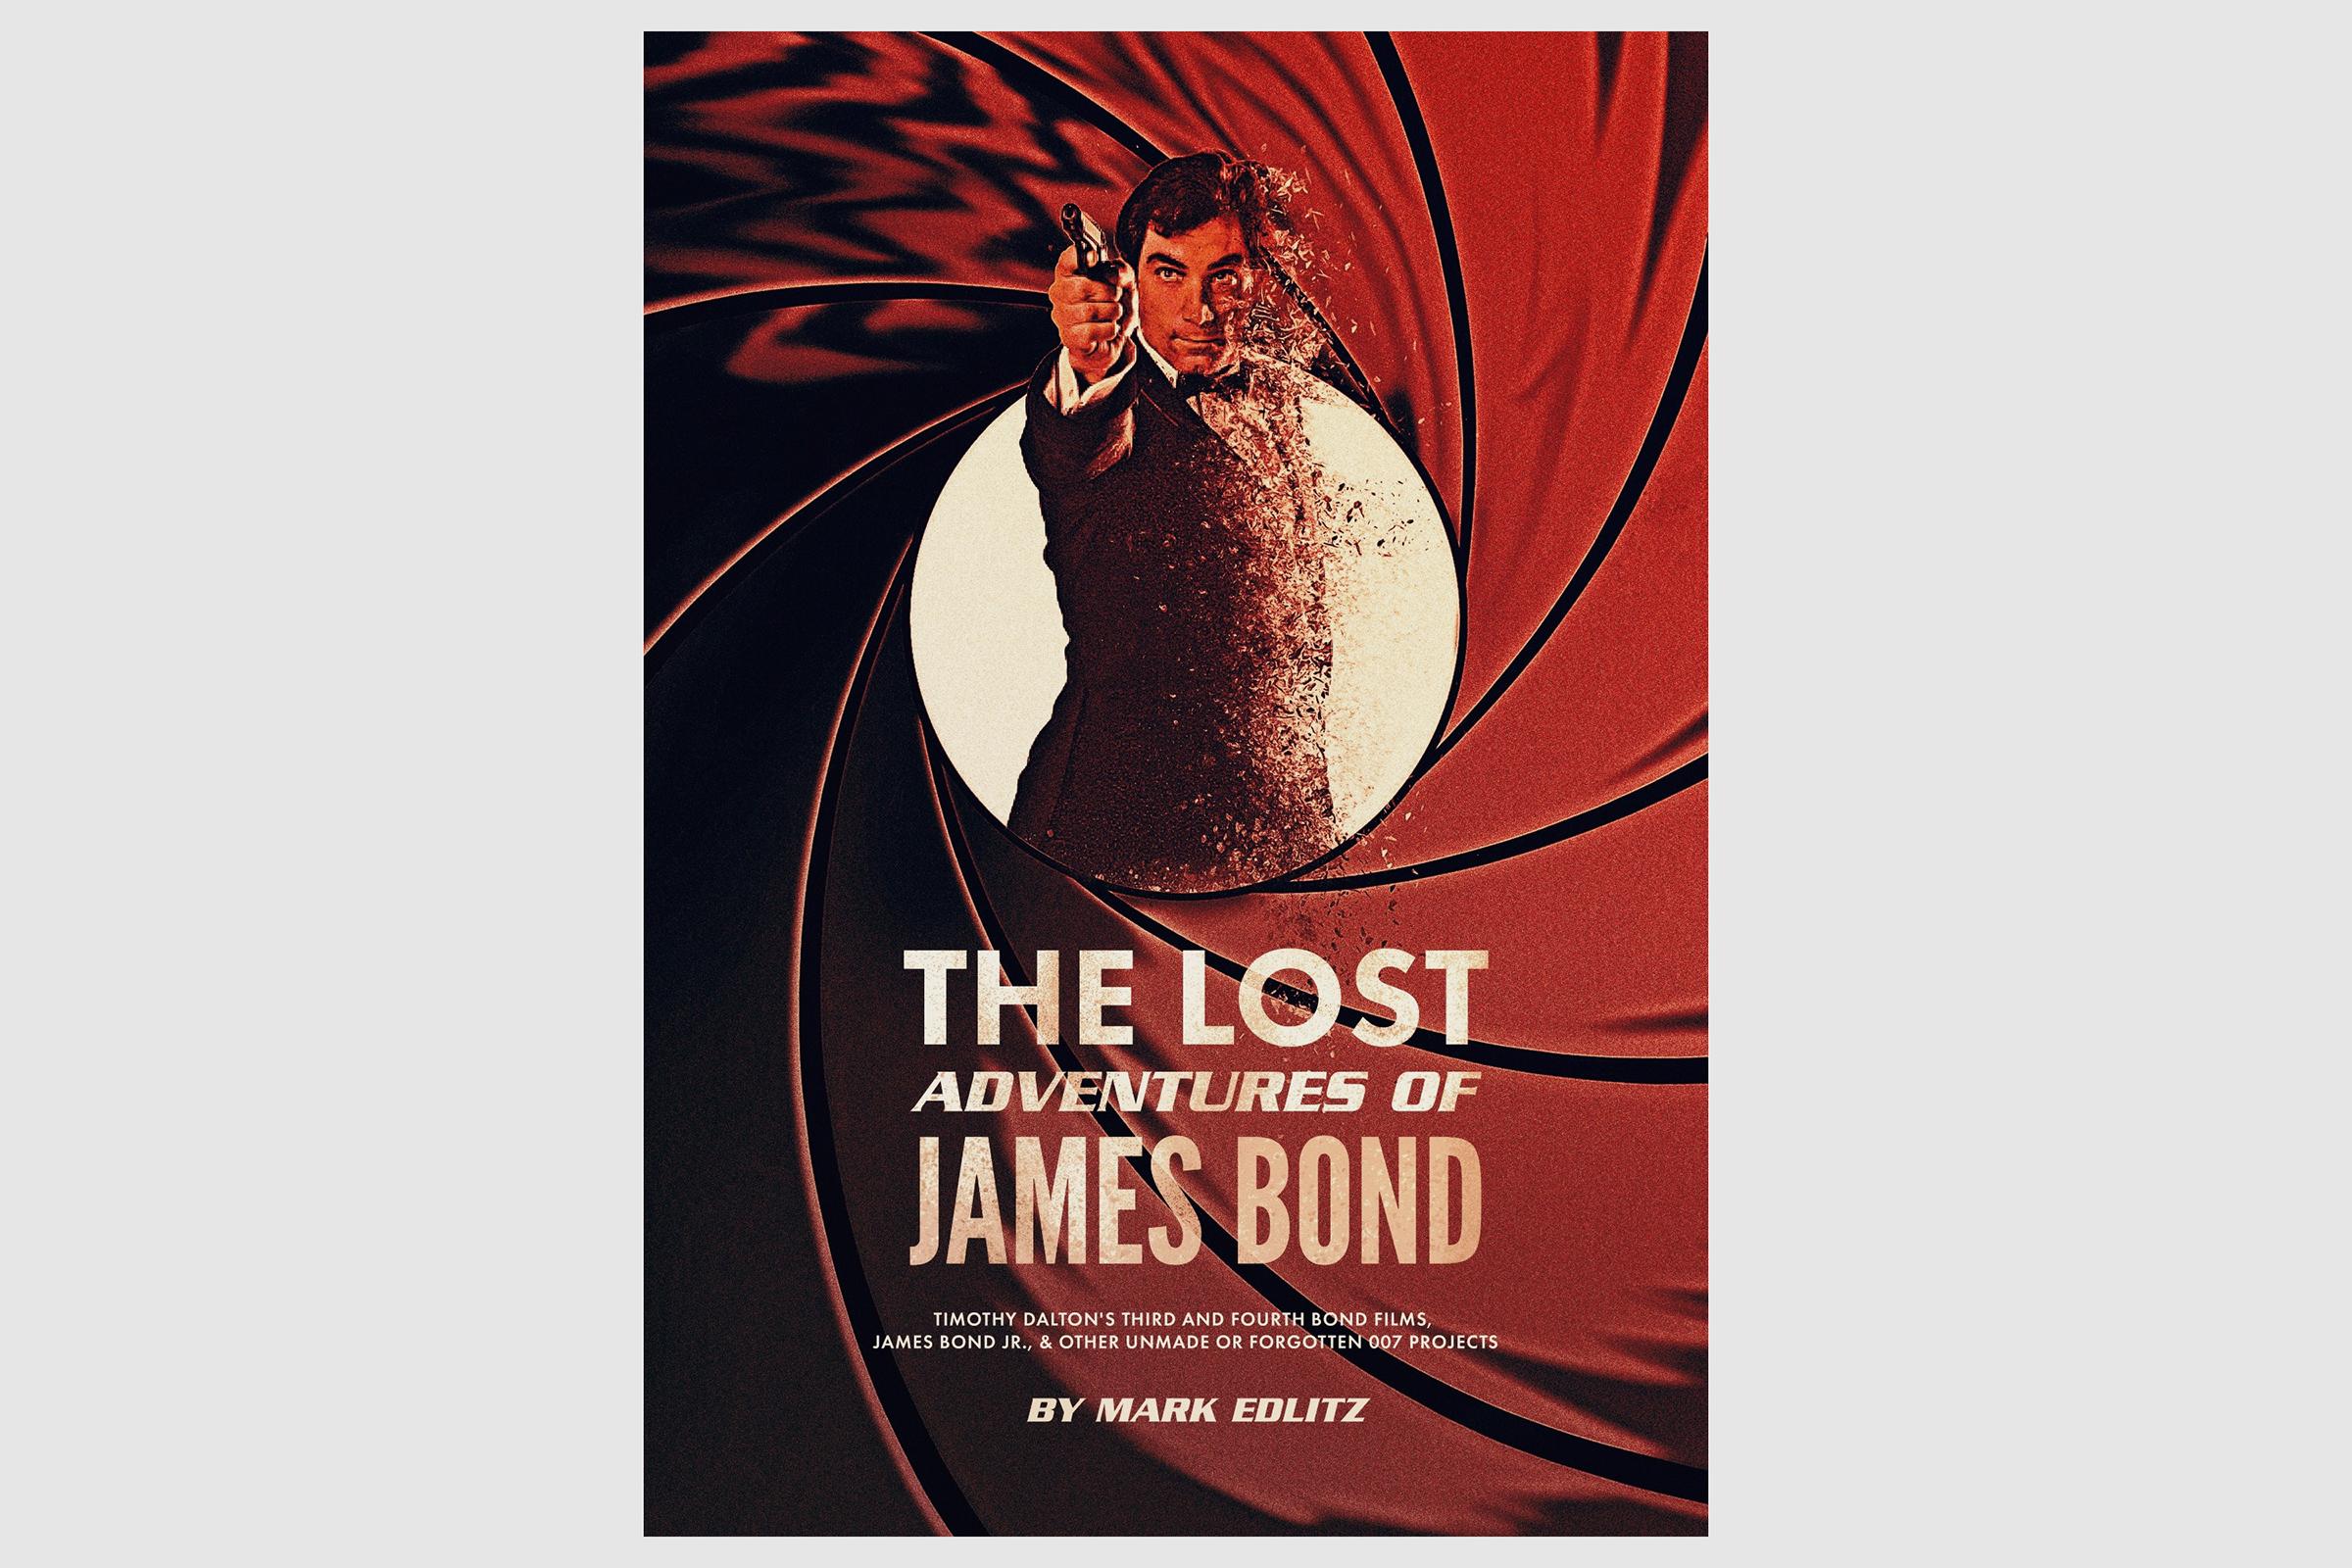 lost adventures of james bond